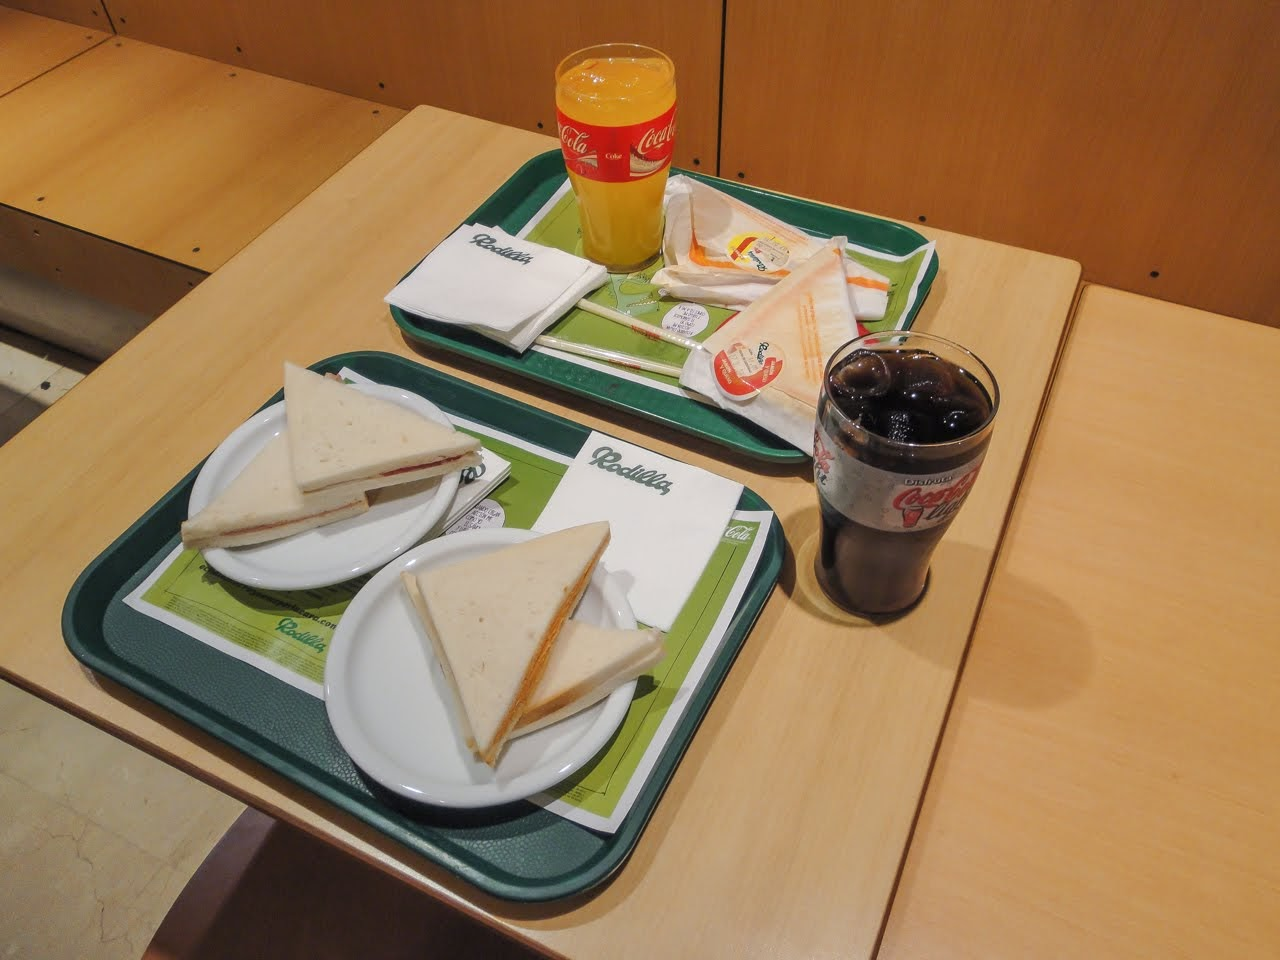 Sandwiches from a restaurant chain called Rodilla